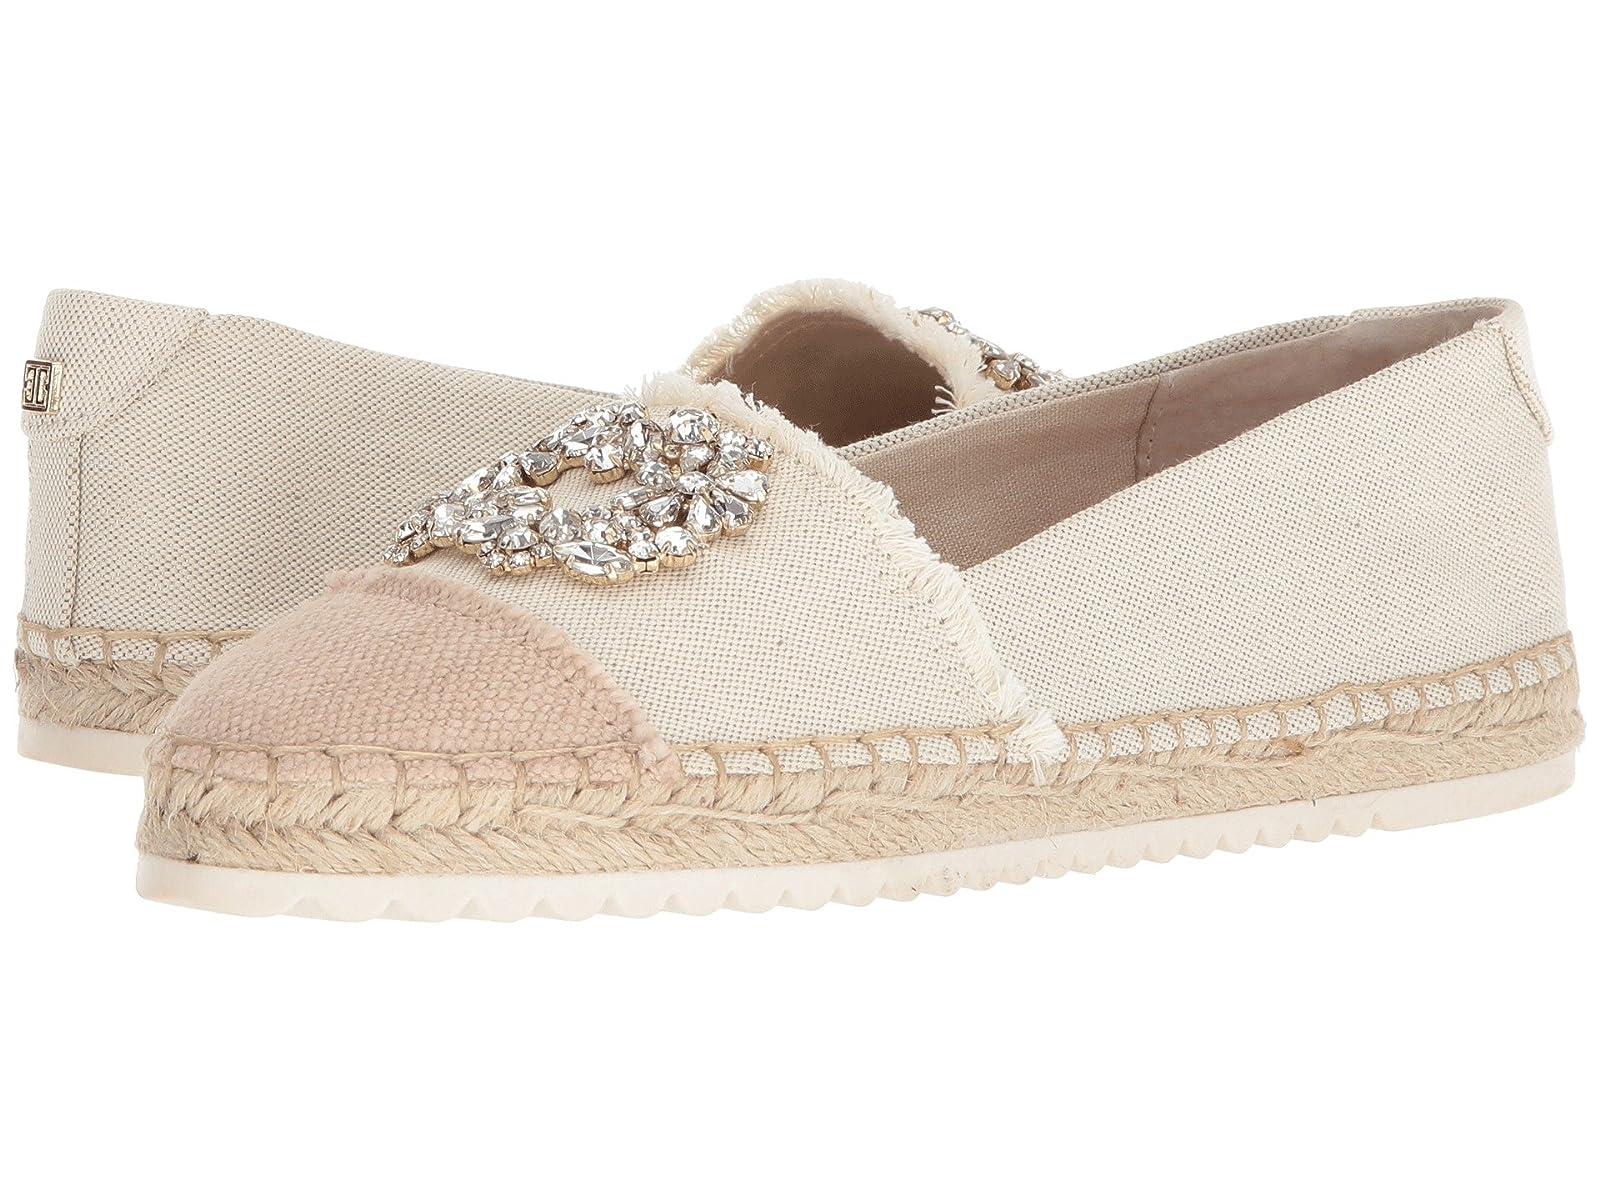 Ivanka Trump FylerCheap and distinctive eye-catching shoes